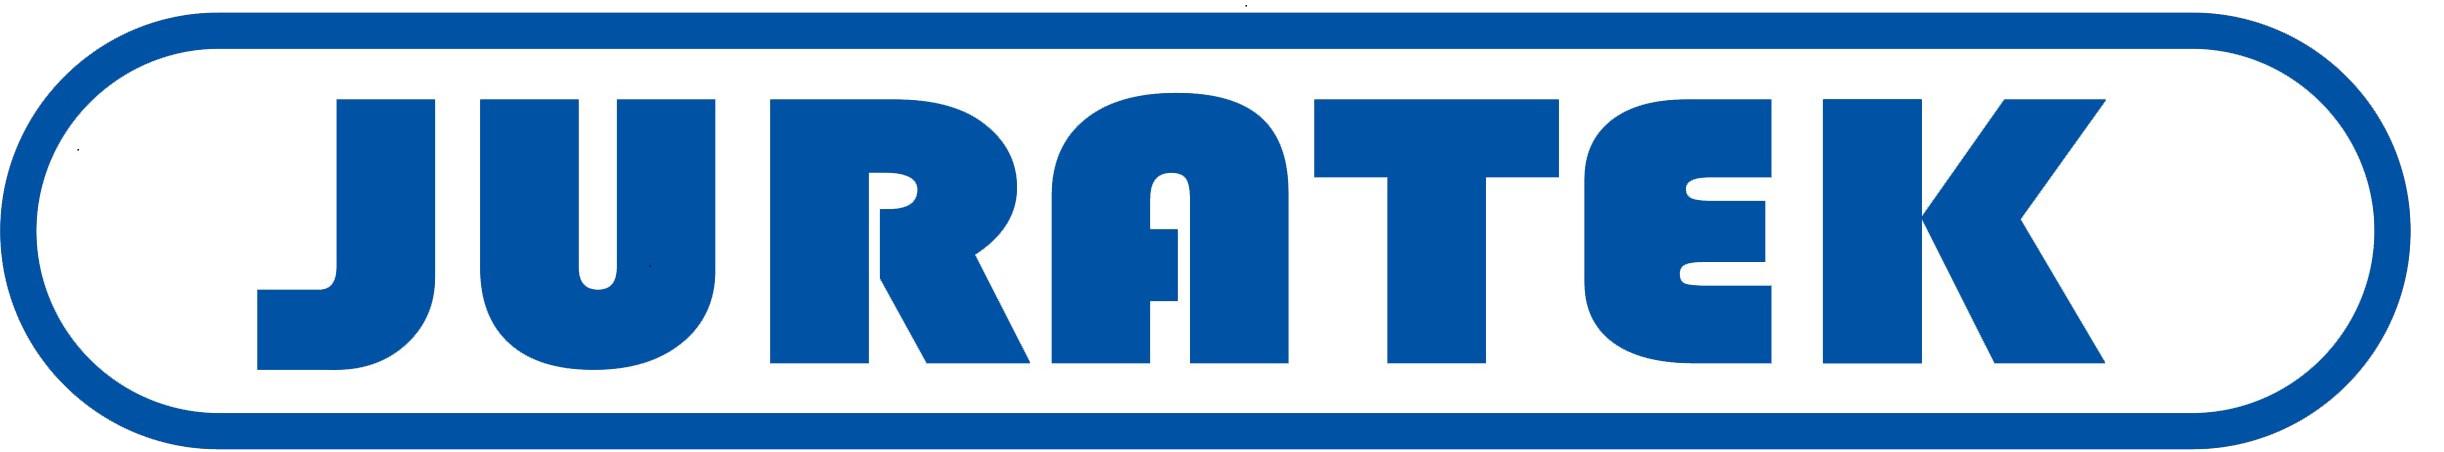 Juratec logo